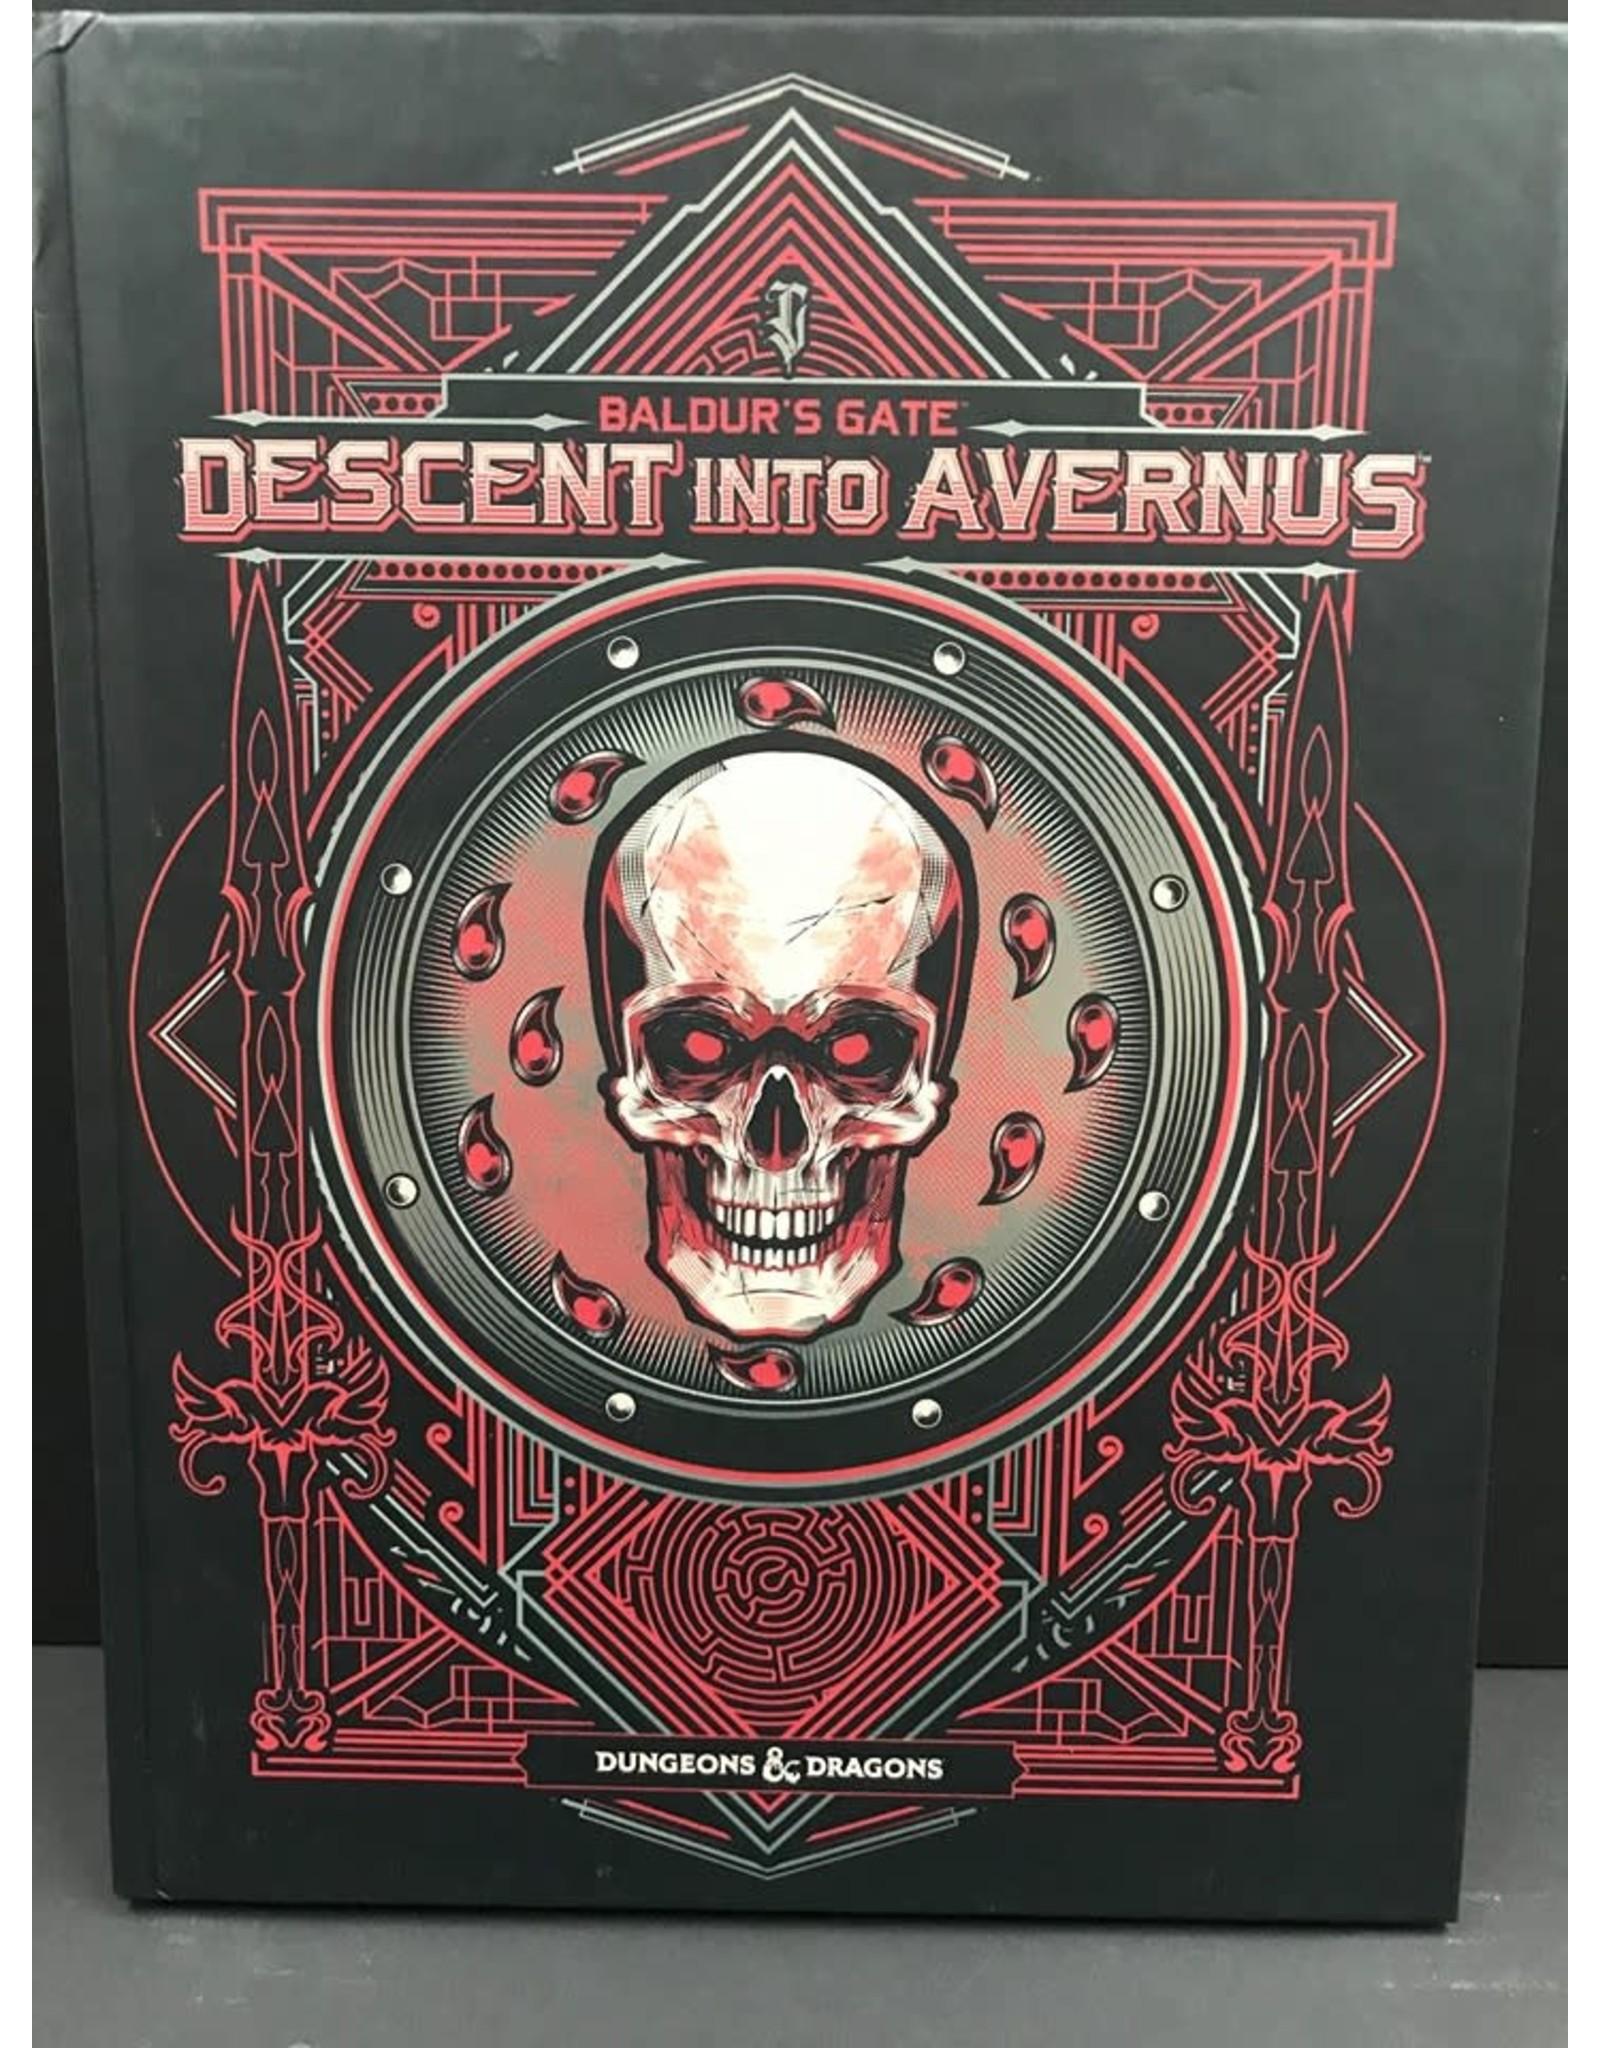 Baldur's Gate: Descent Into Avernus Deluxe Edition